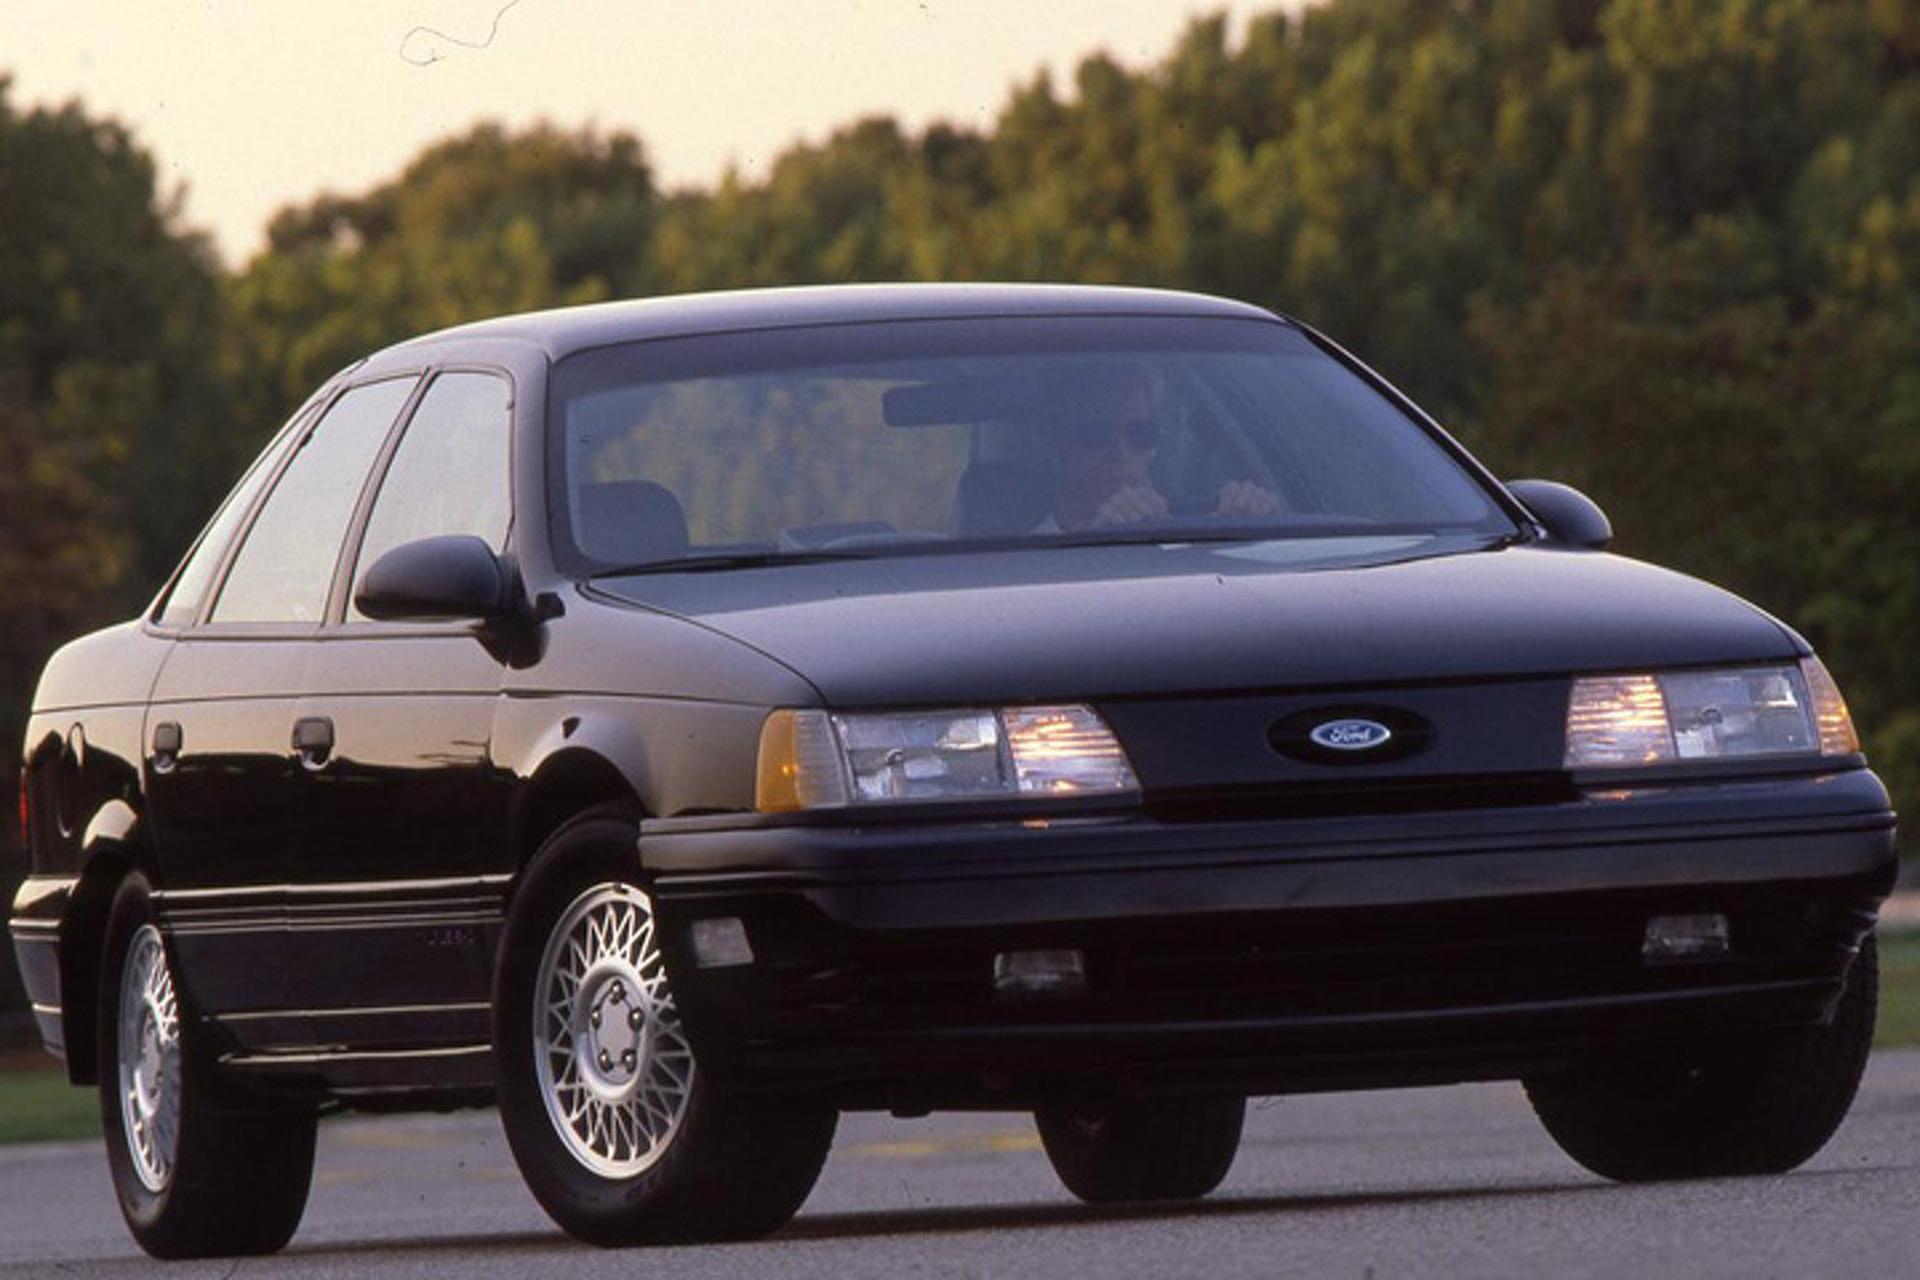 Ford Taurus SHO (1989-1991) front 3/4 marketing photo